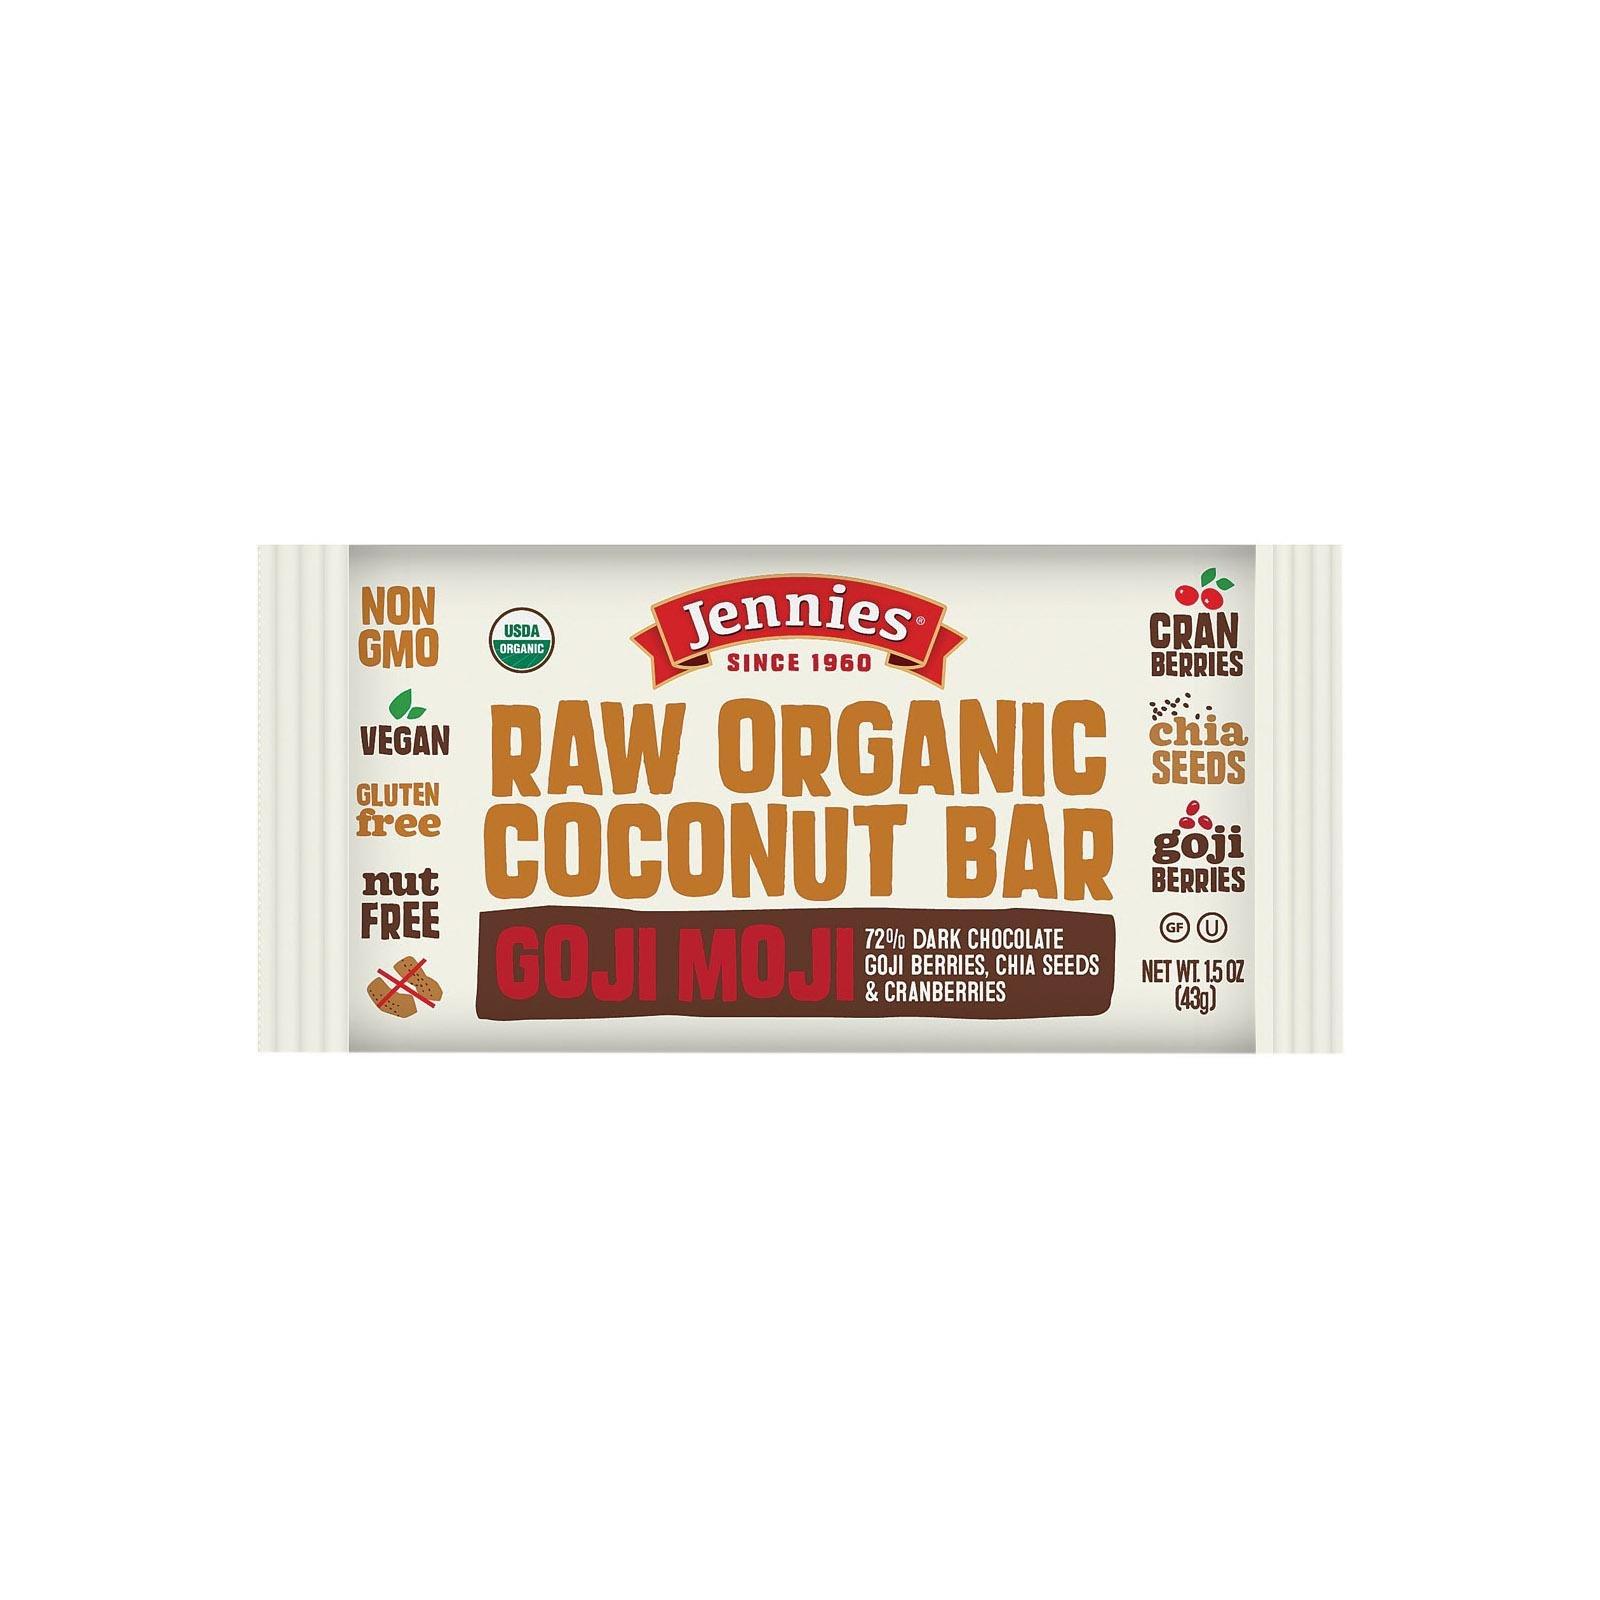 Jennies Bar coconut Goji Moji Raw Organic, 1.5 oz by Jennies (Image #1)